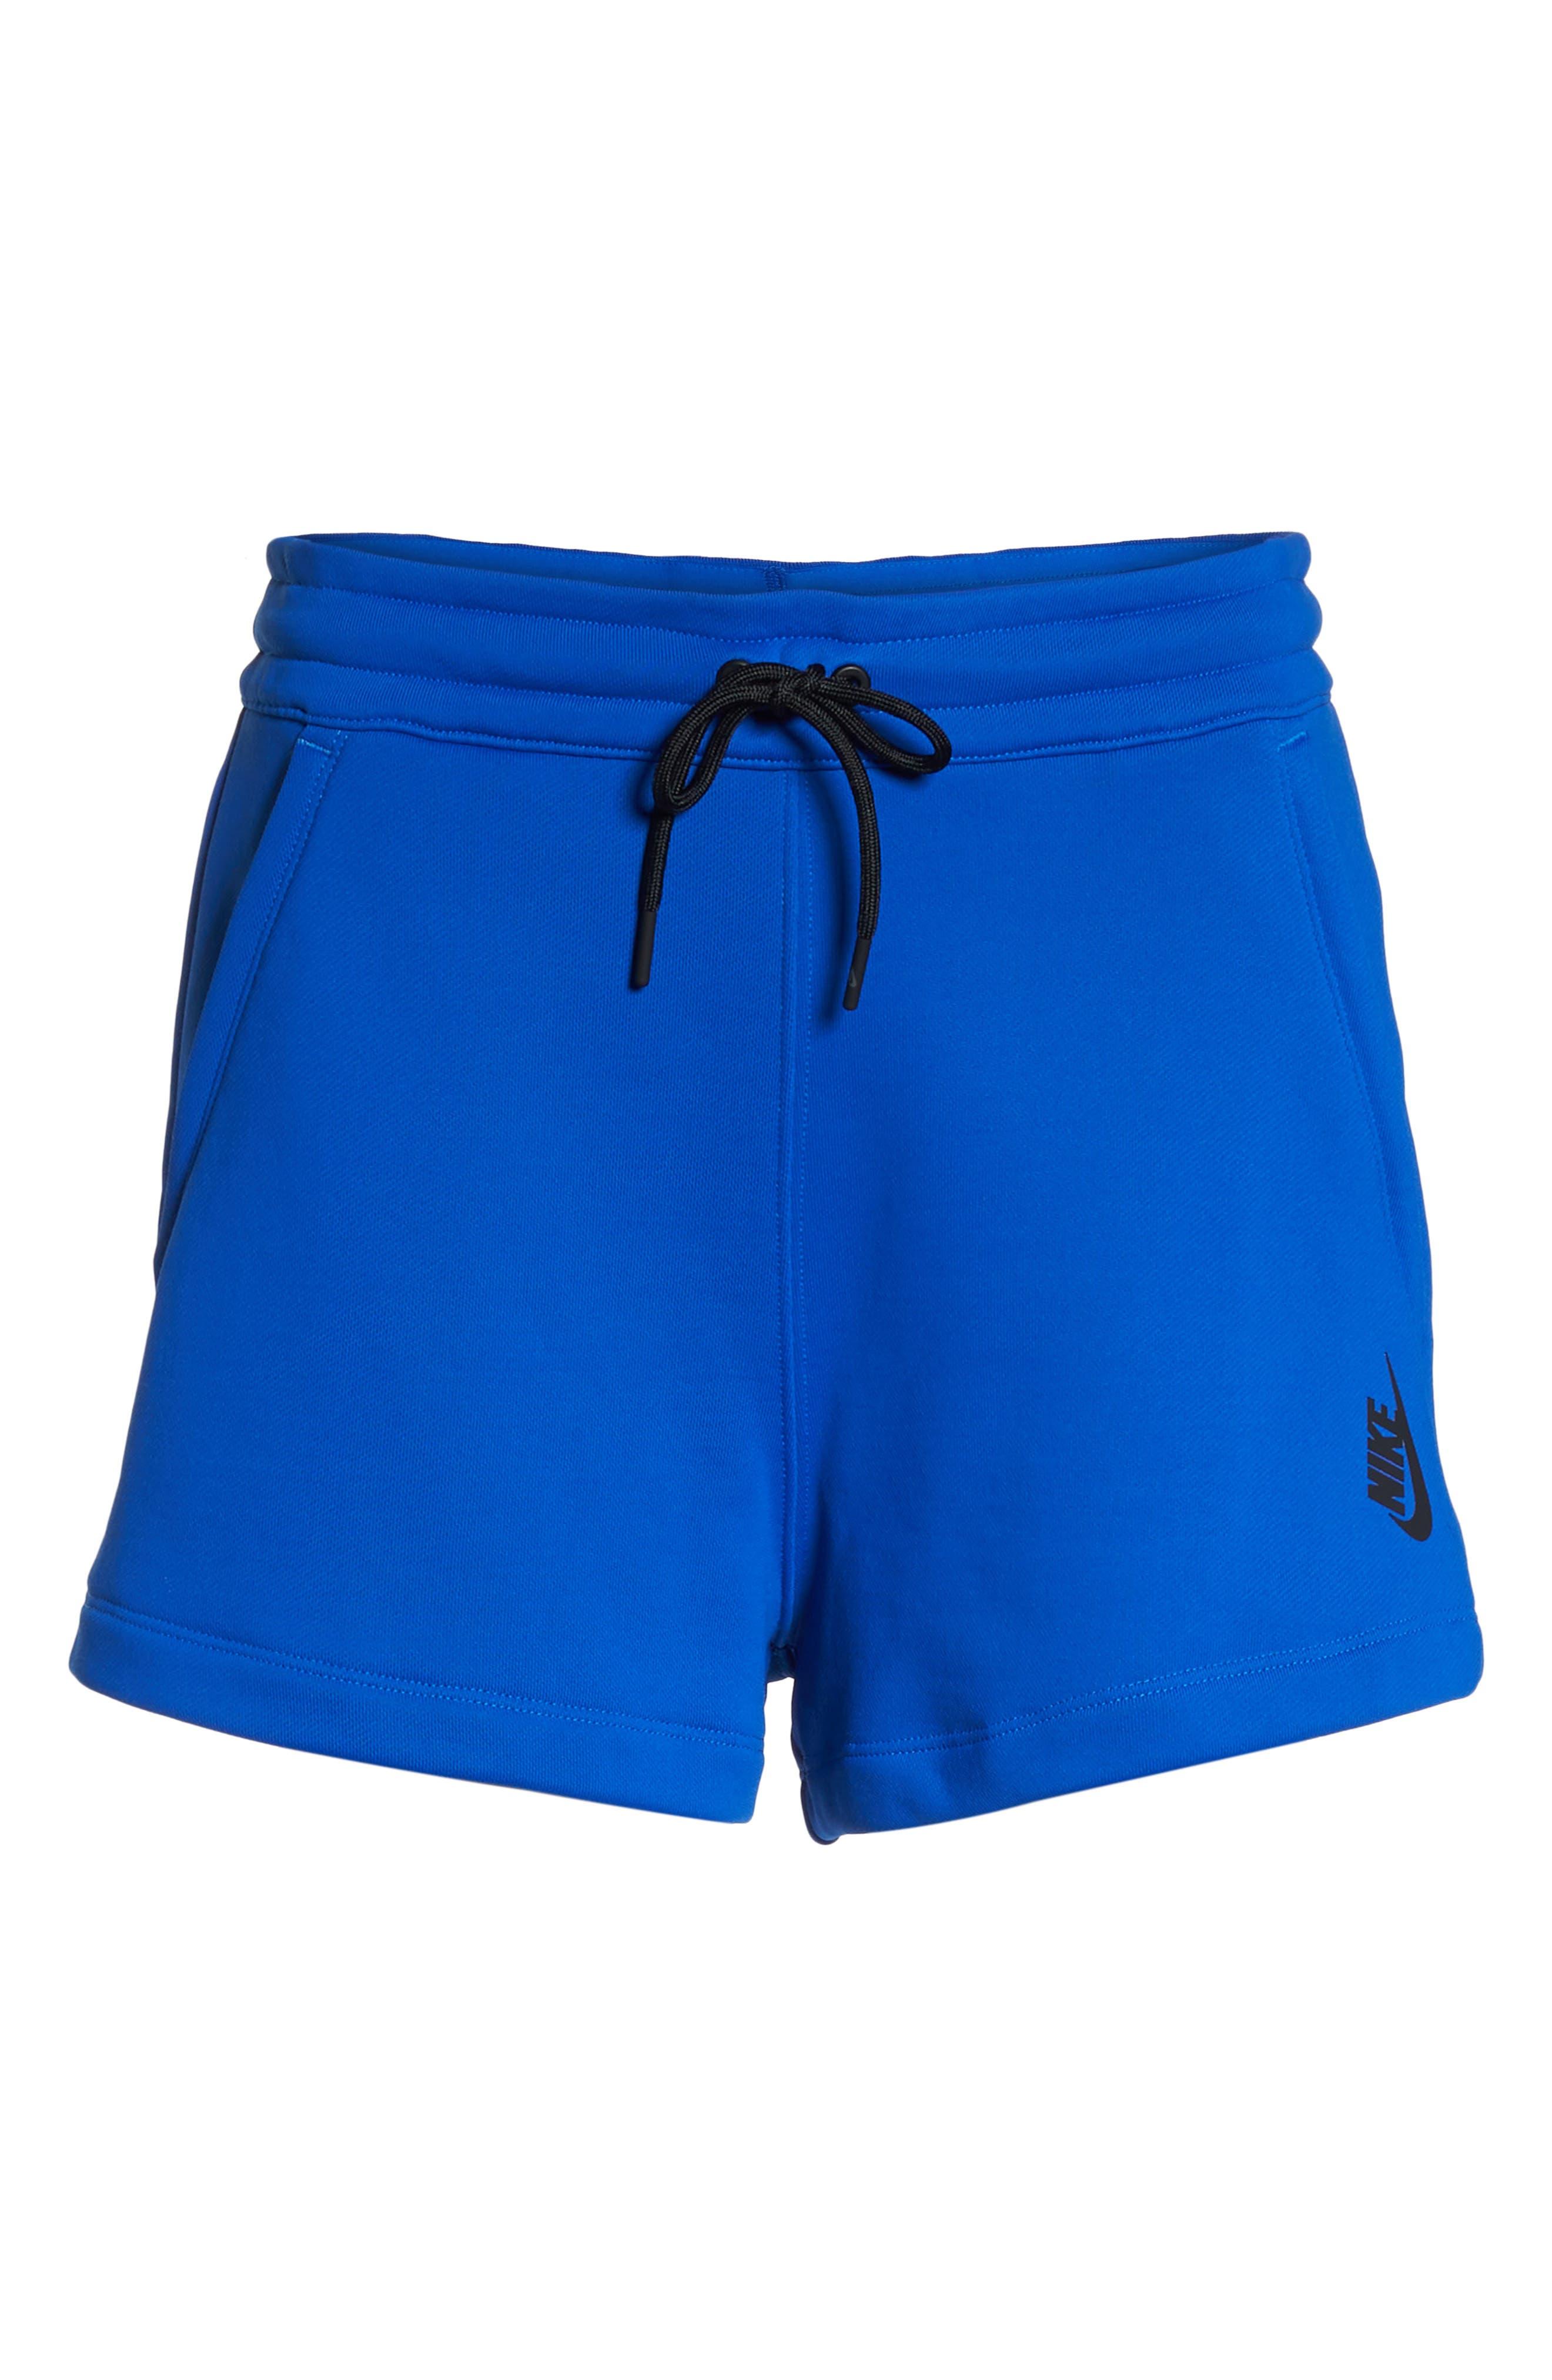 NikeLab Collection Women's Fleece Shorts,                             Alternate thumbnail 8, color,                             Hyper Cobalt/ Black